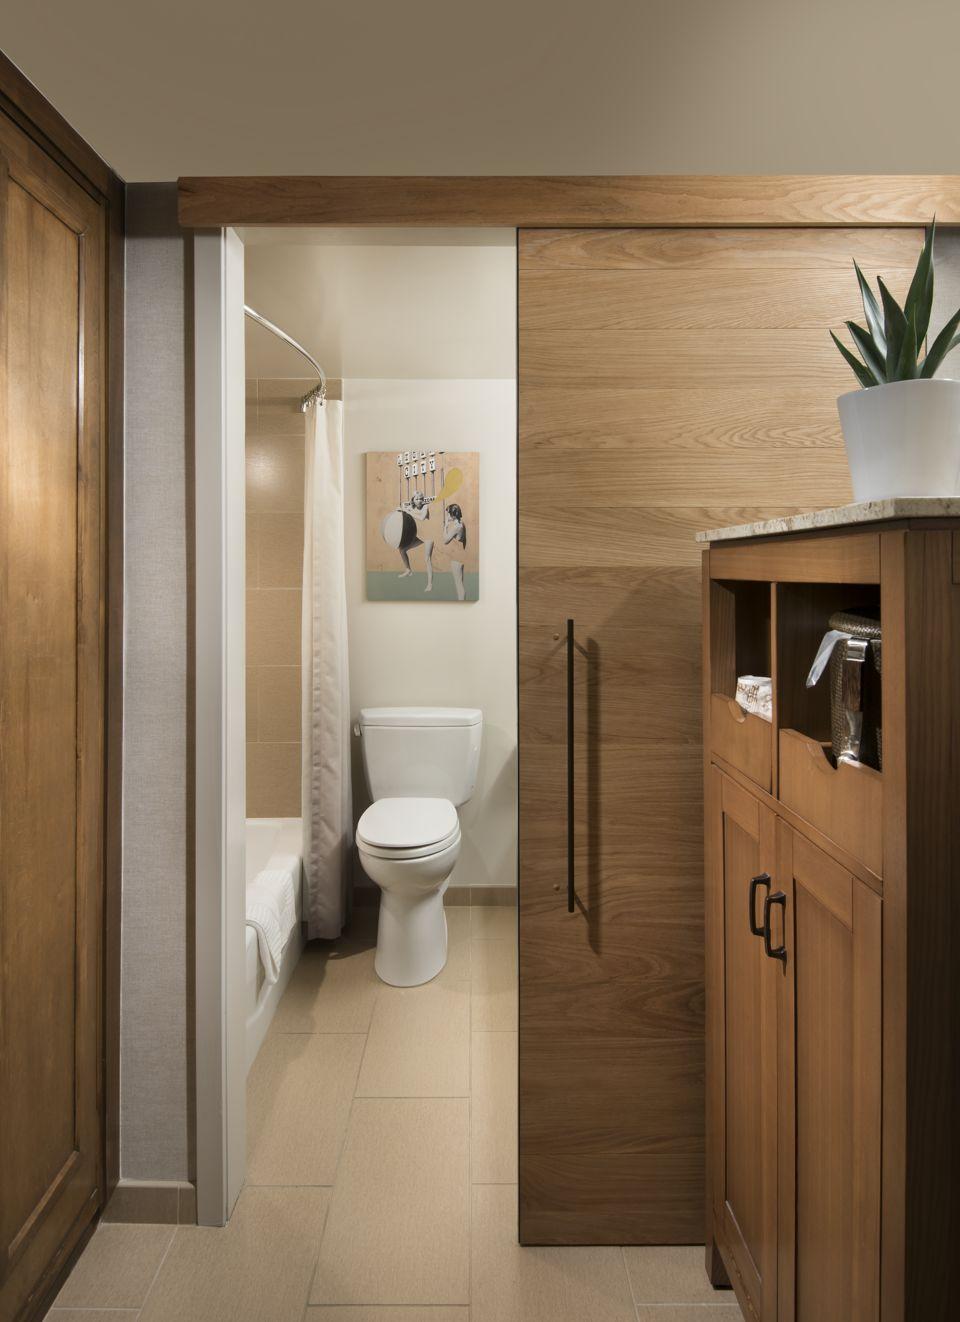 Model_room_bath_one